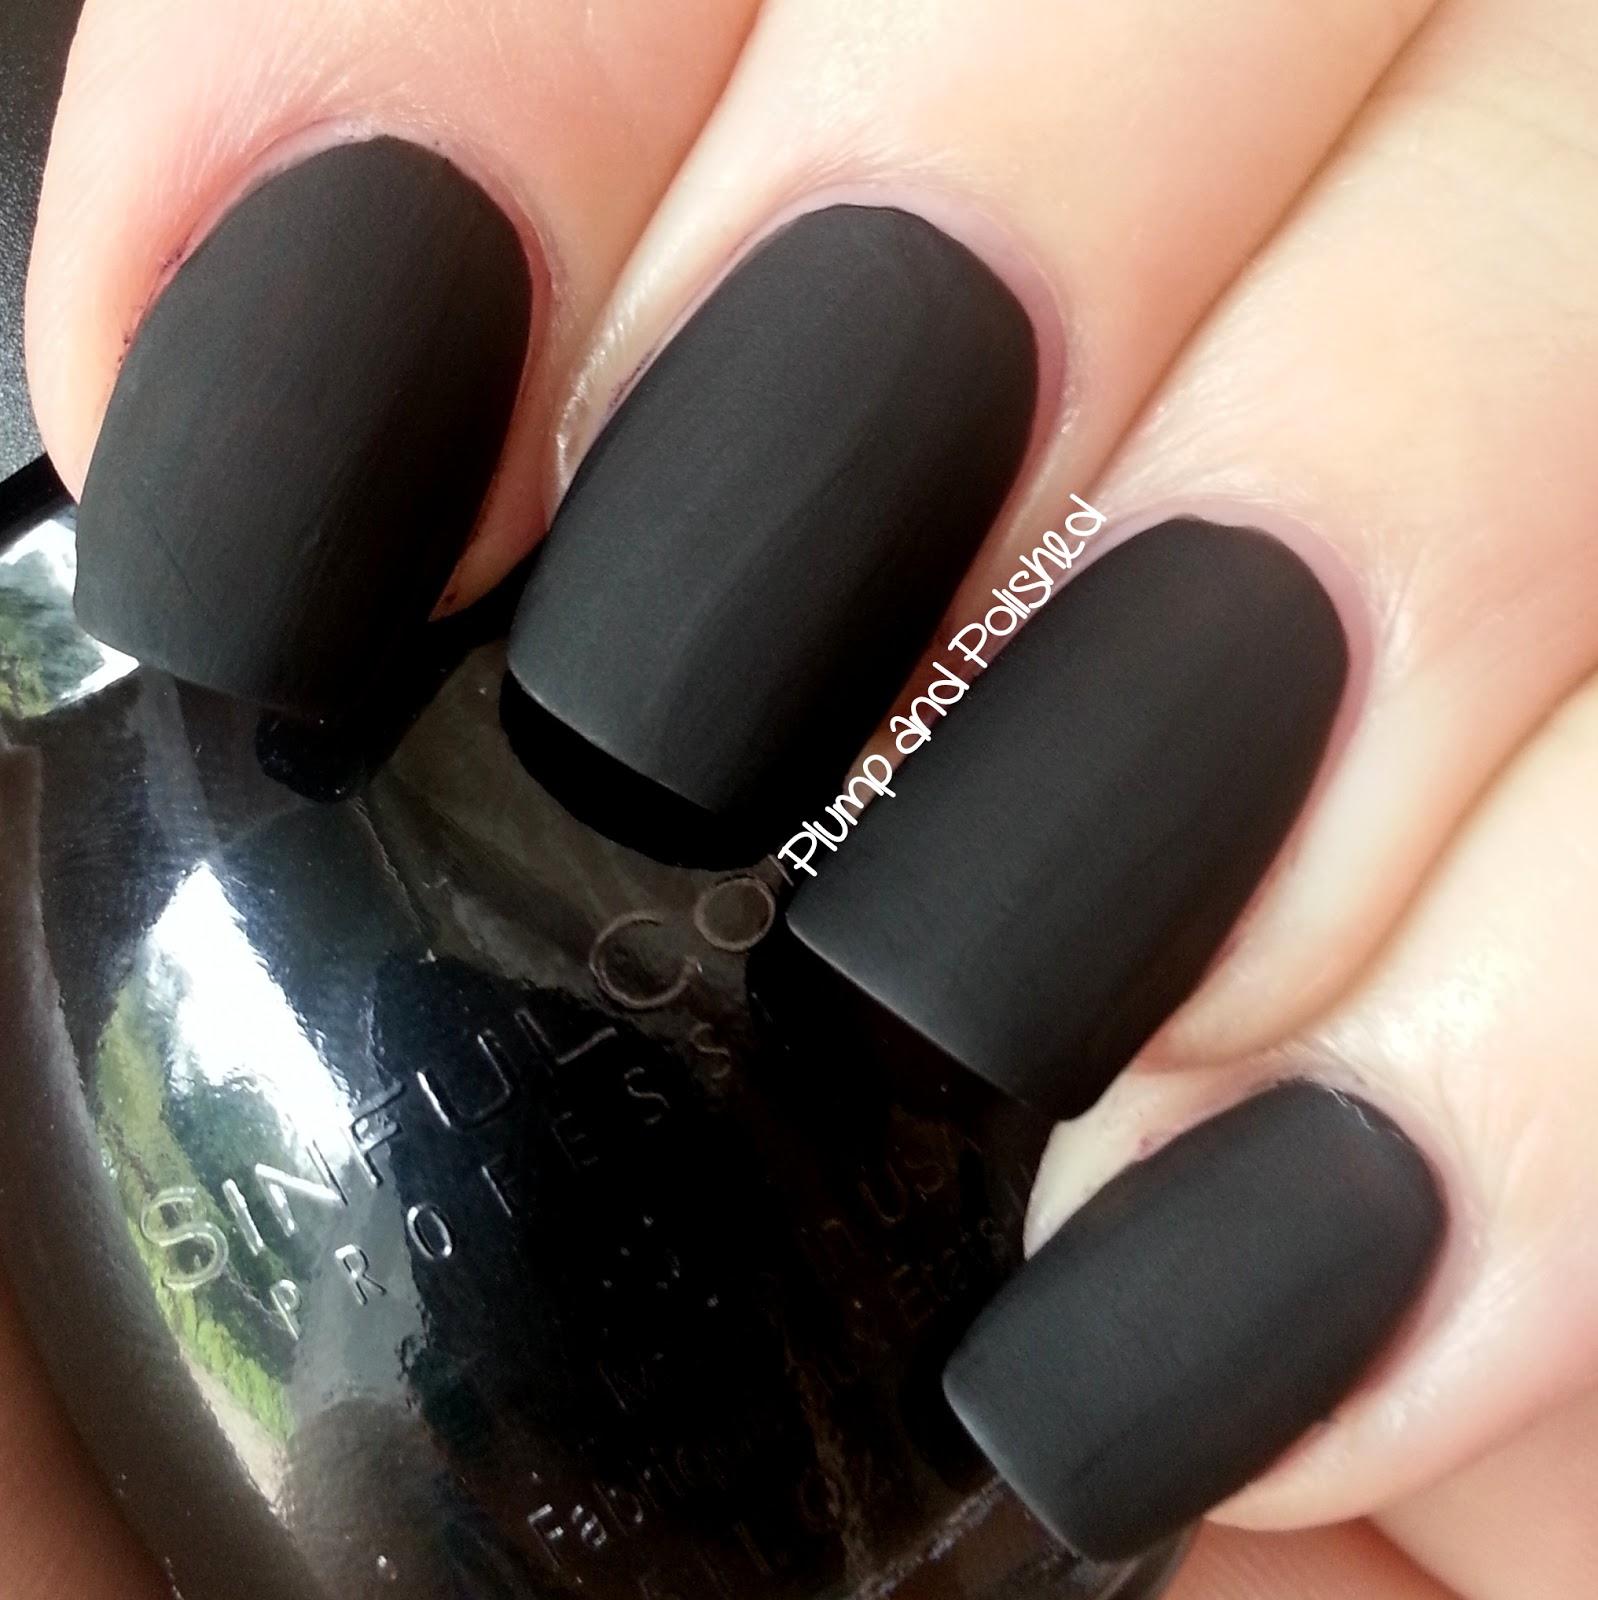 Black Nail Polish Colors: Plump And Polished: Sinful Colors